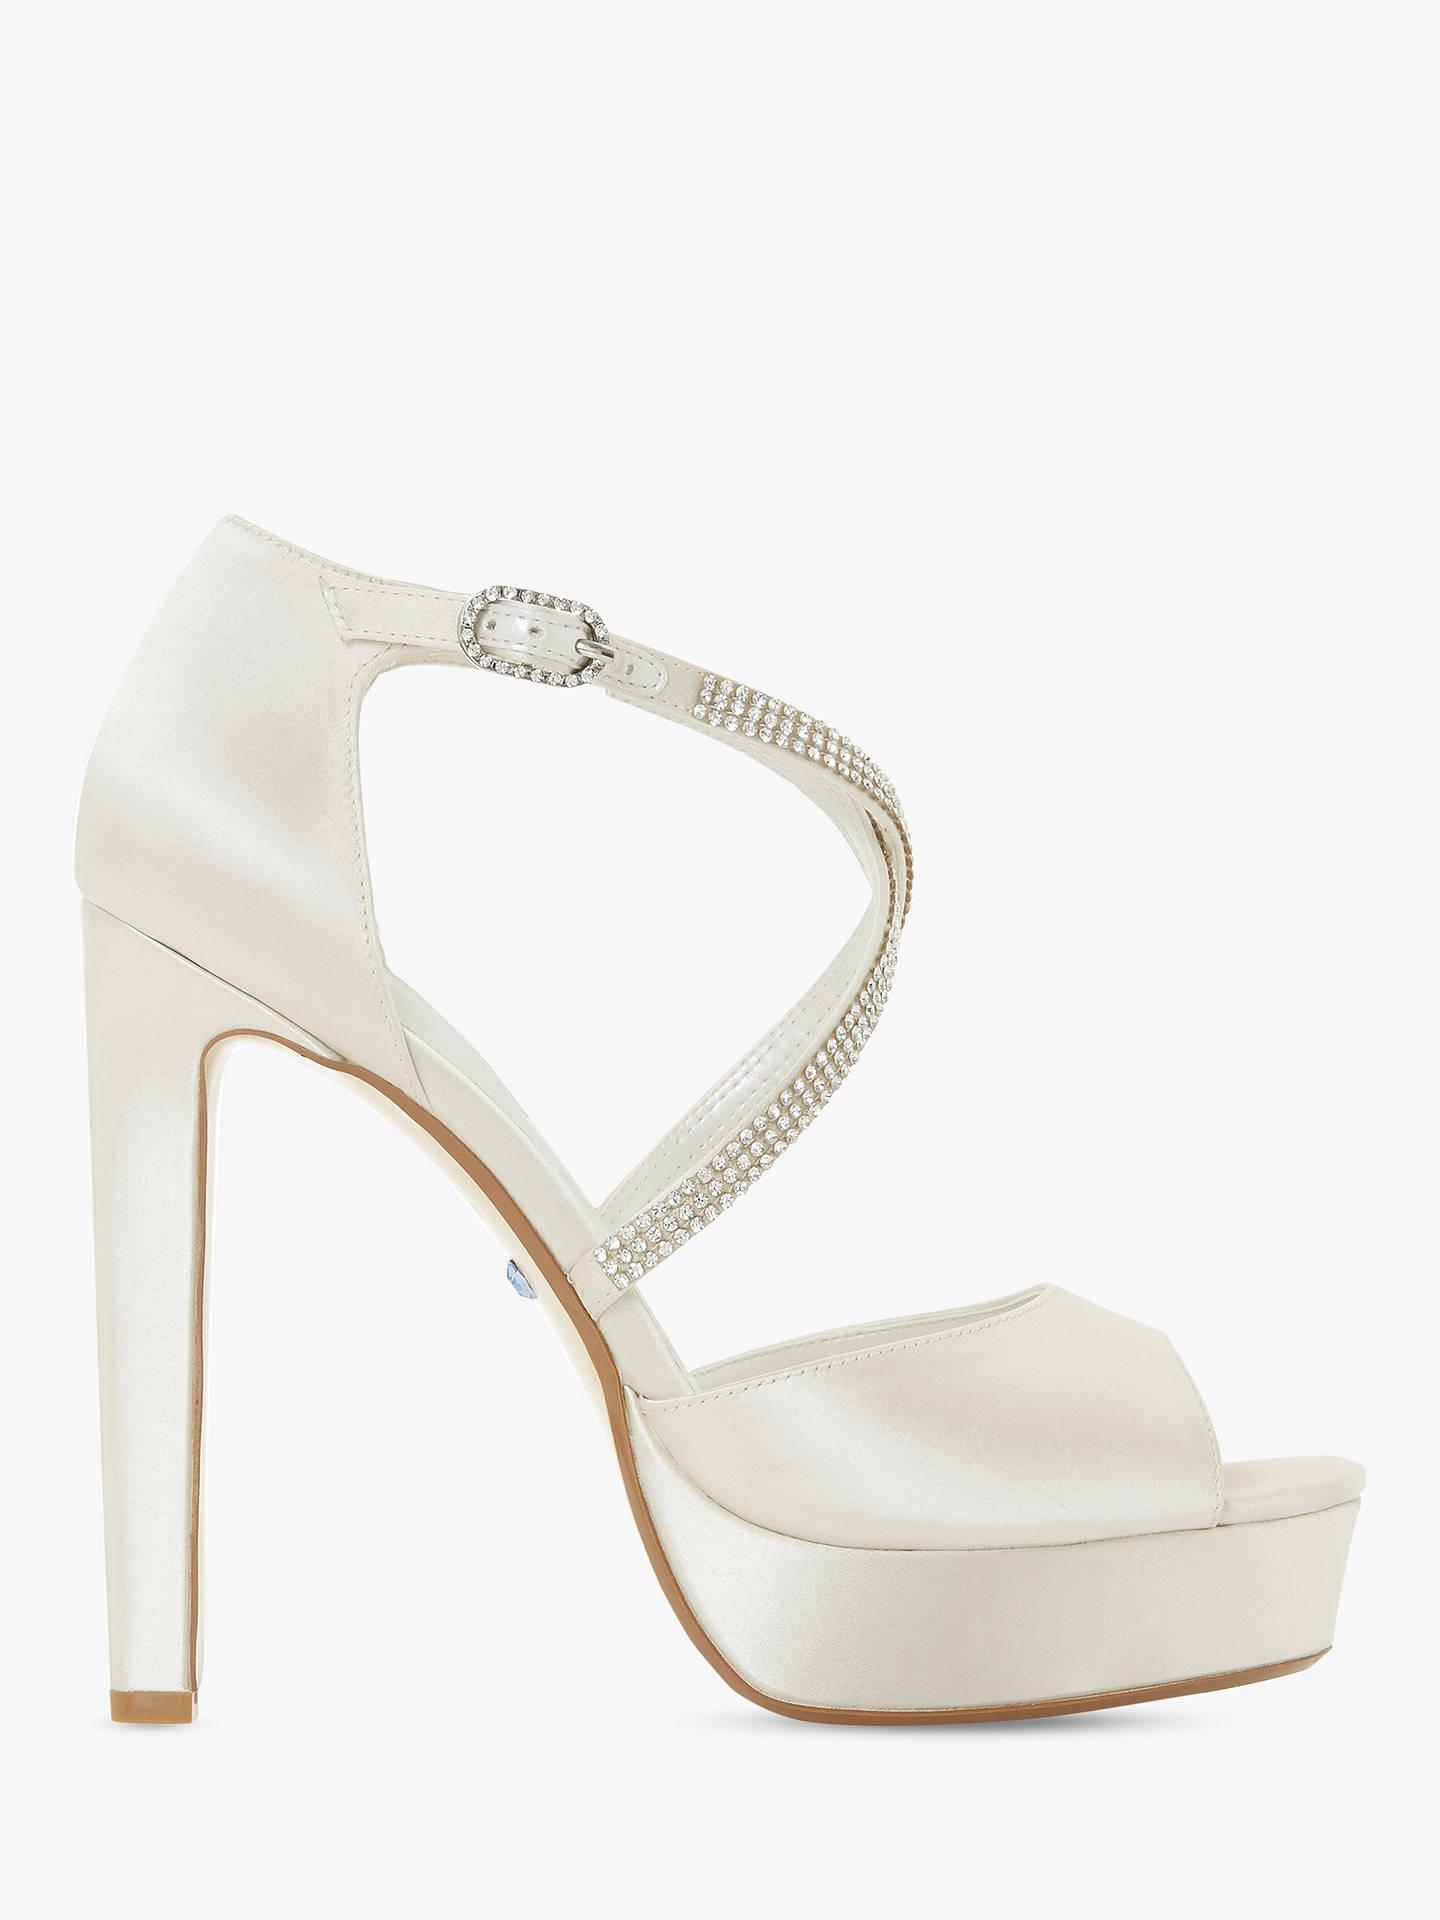 8e826f75360 Buy Dune Makeup Bridal Collection High Heel Platform Sandals